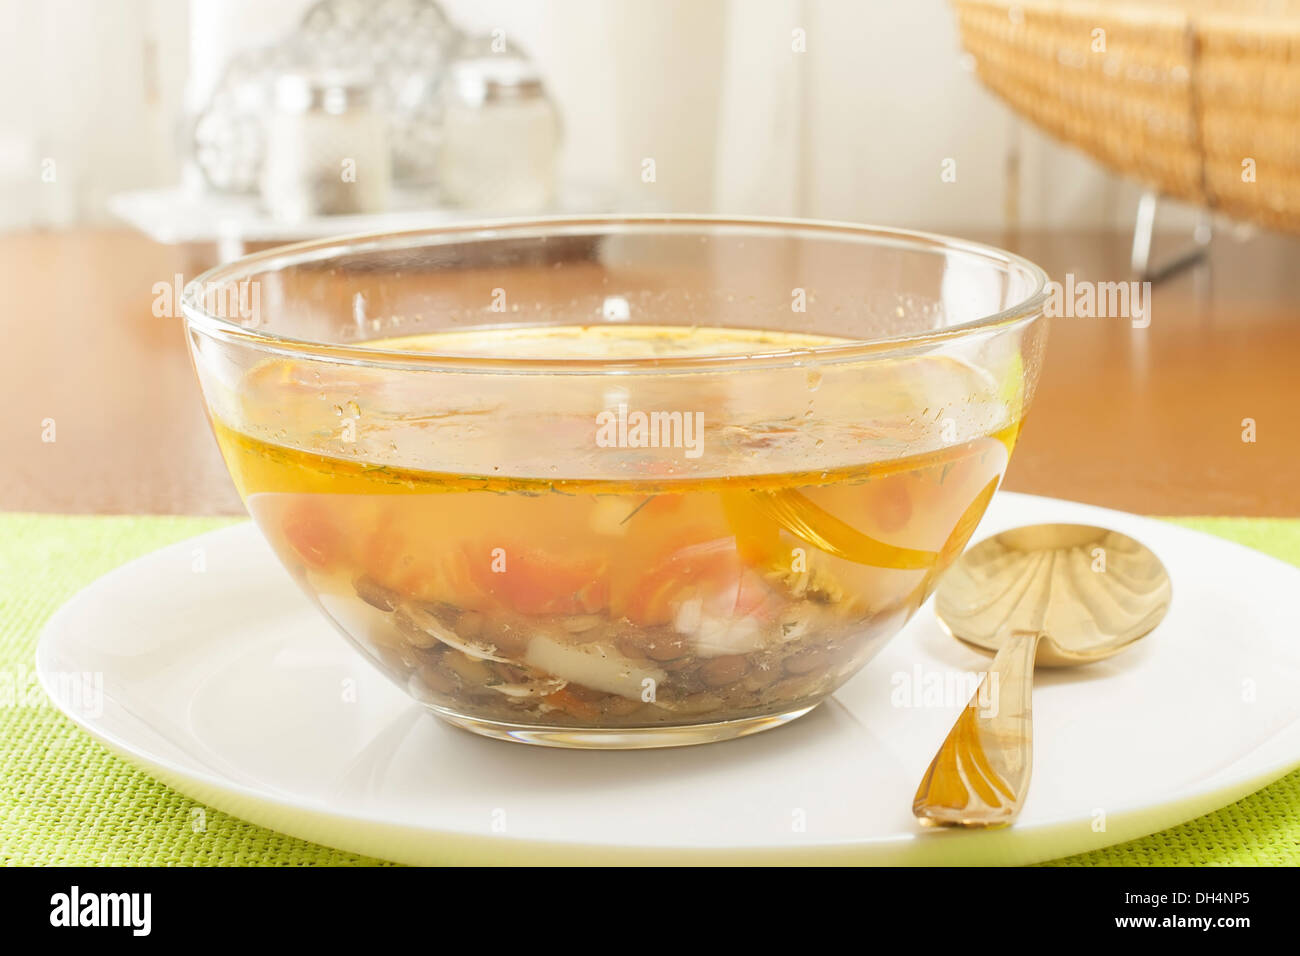 transparent lentil soup in a glass dish - Stock Image